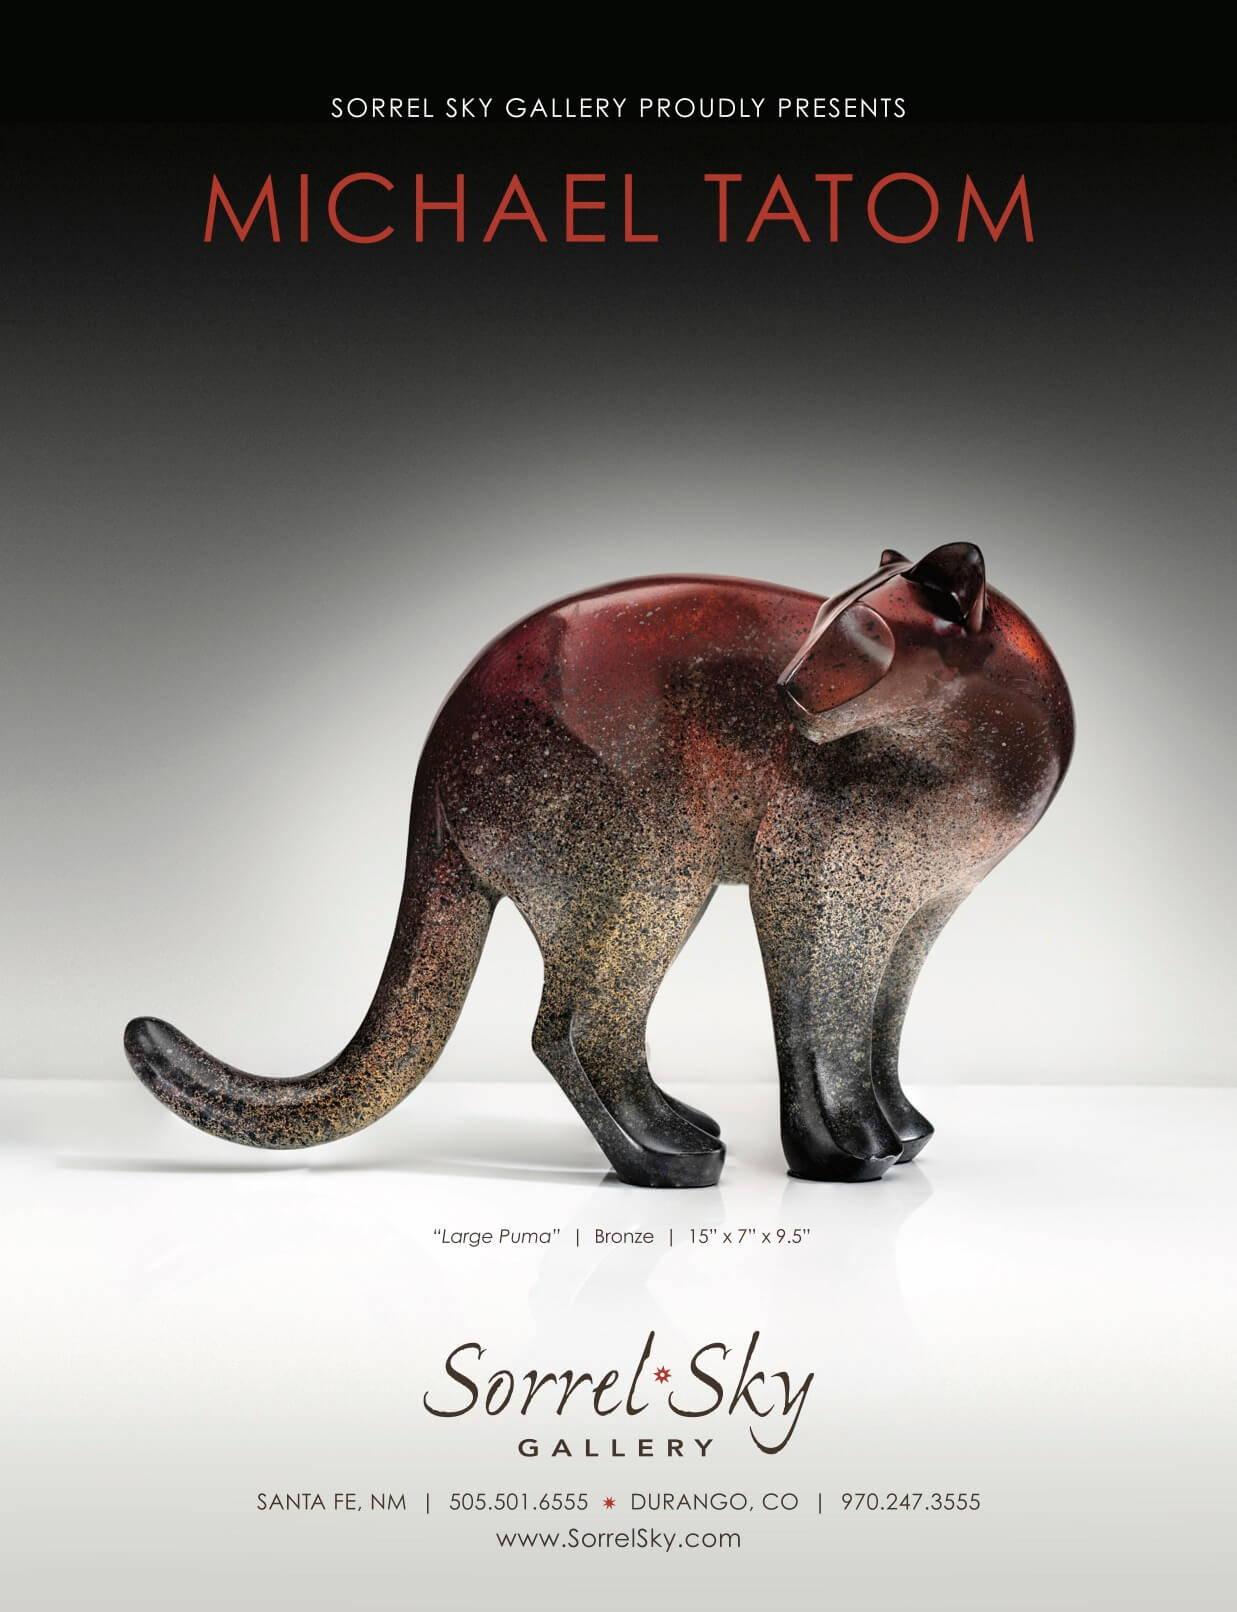 Michael Tatom. Santa Fe Art Gallery. Bronze Sculpture. Monumental Sculpture. Sorrel Sky Gallery.